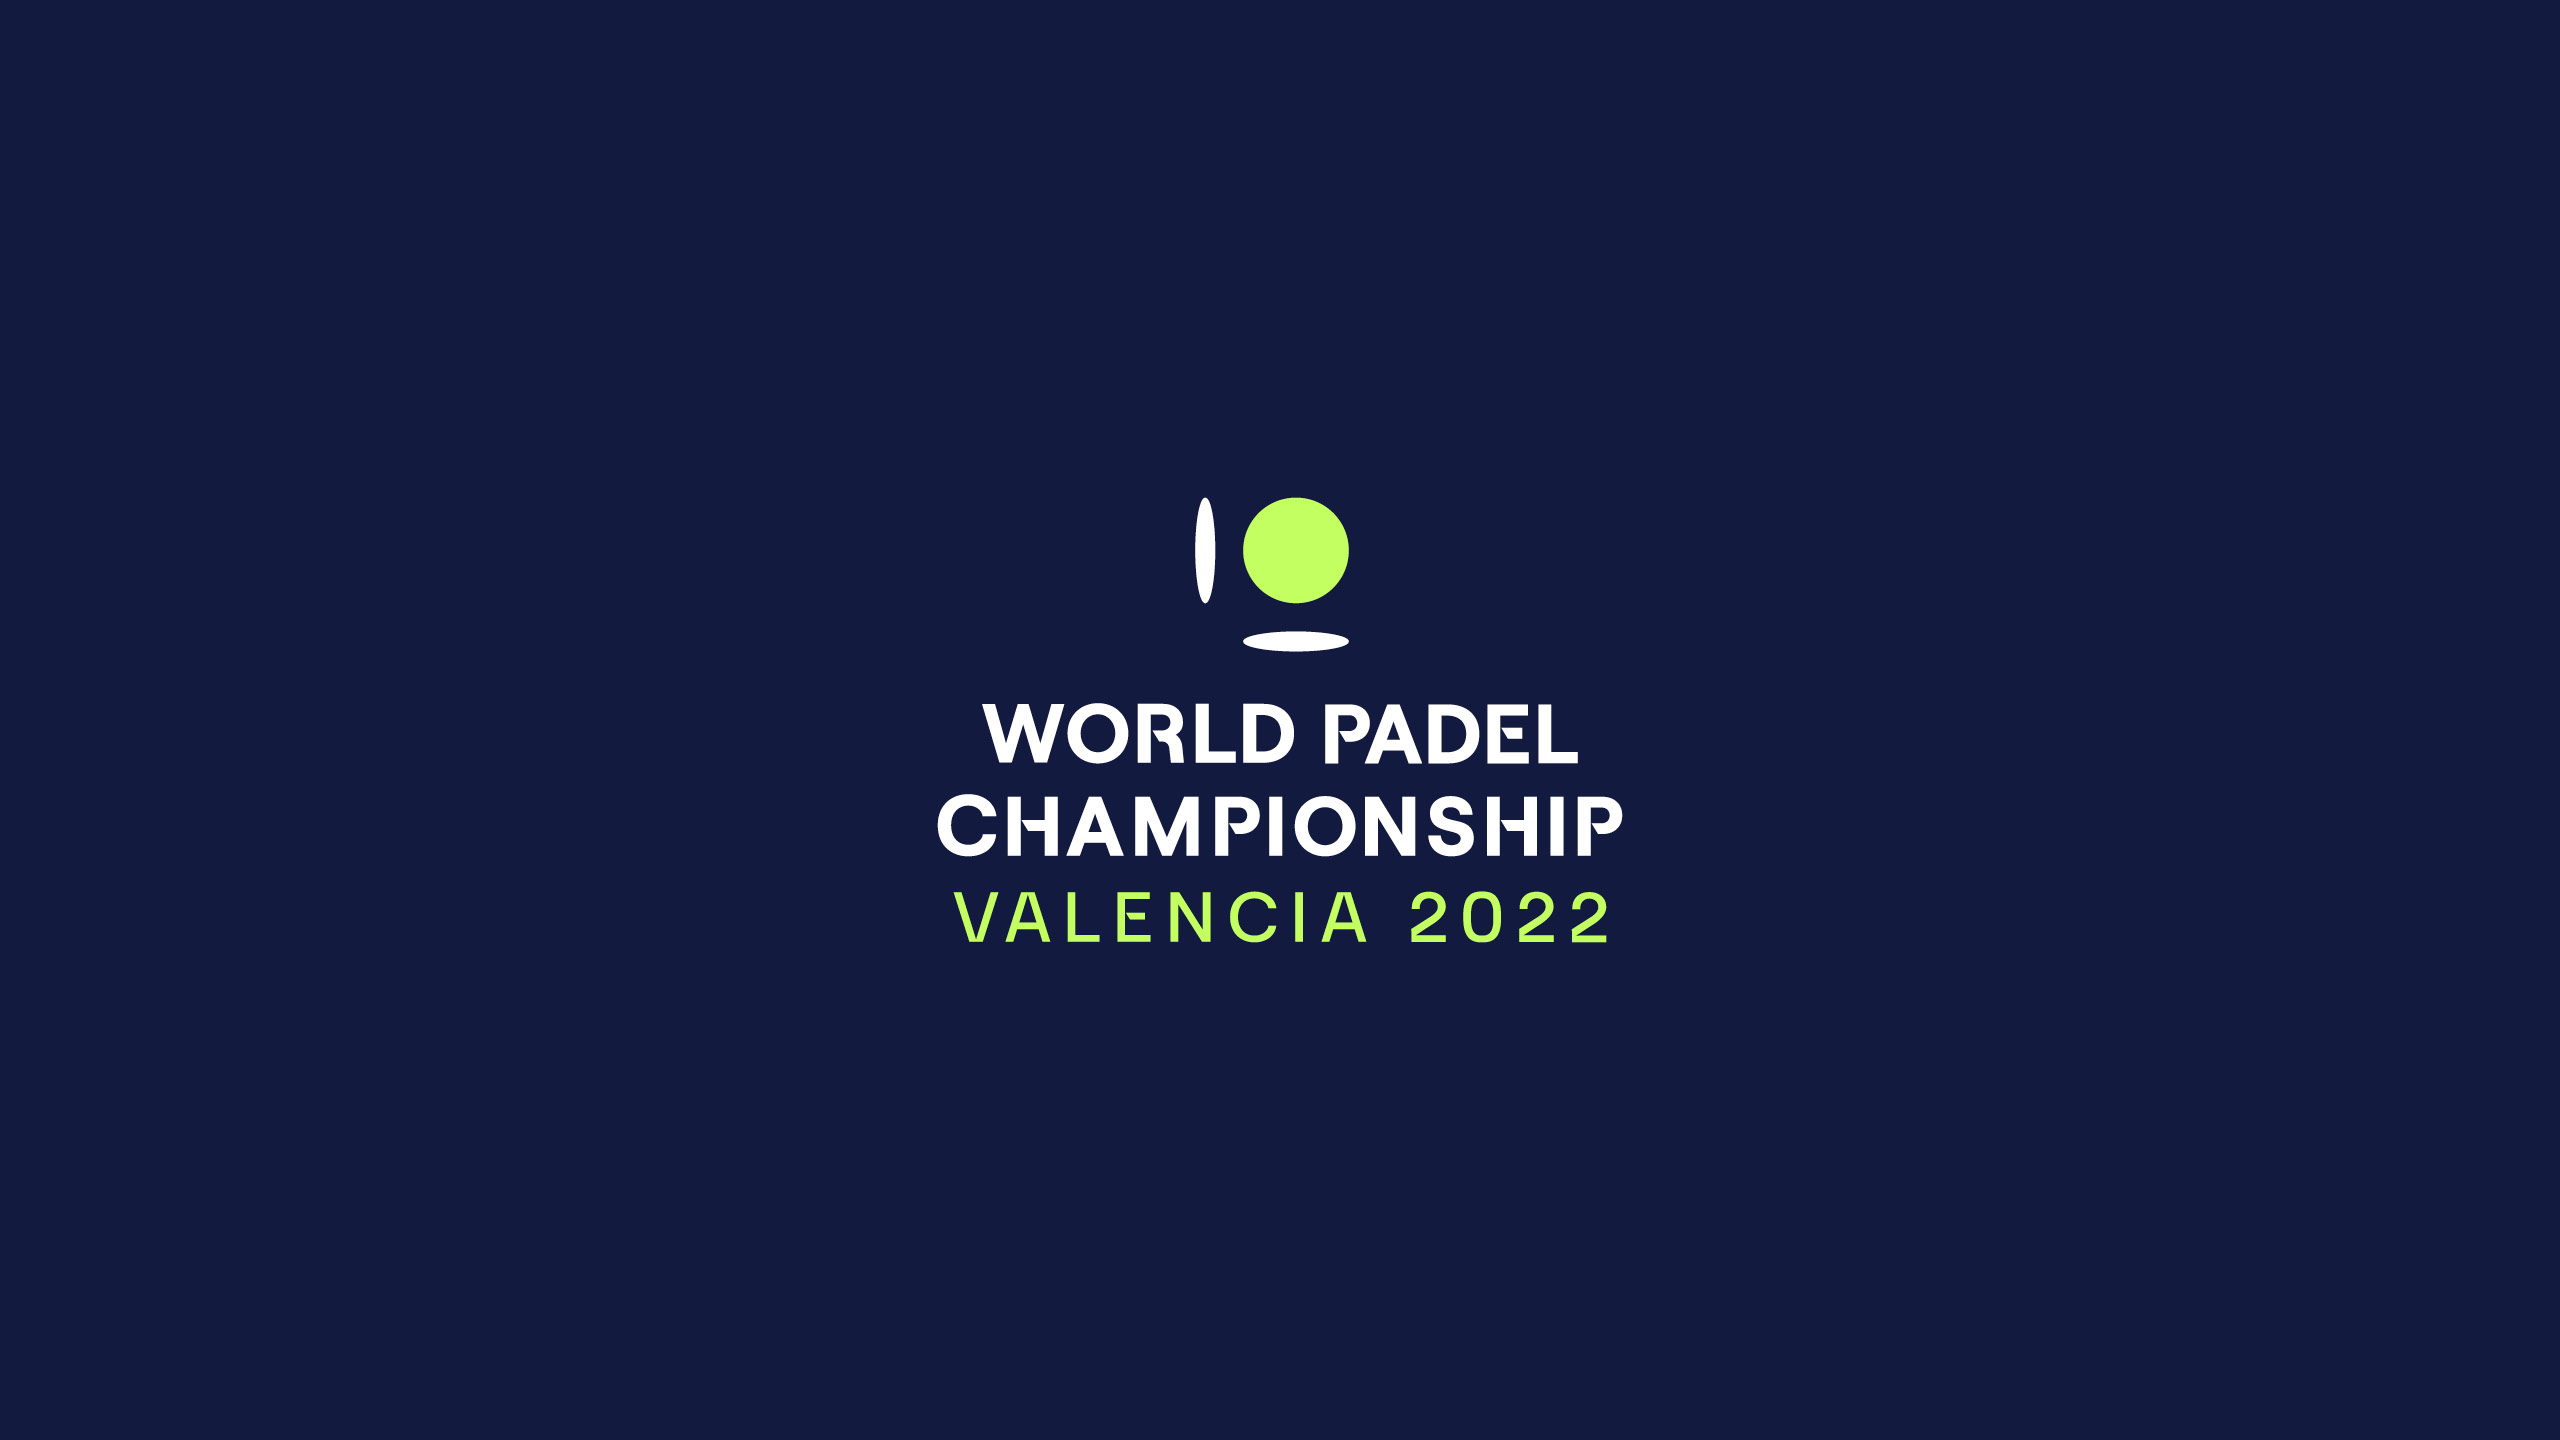 WORLD PADEL CHAMPIONSHIP